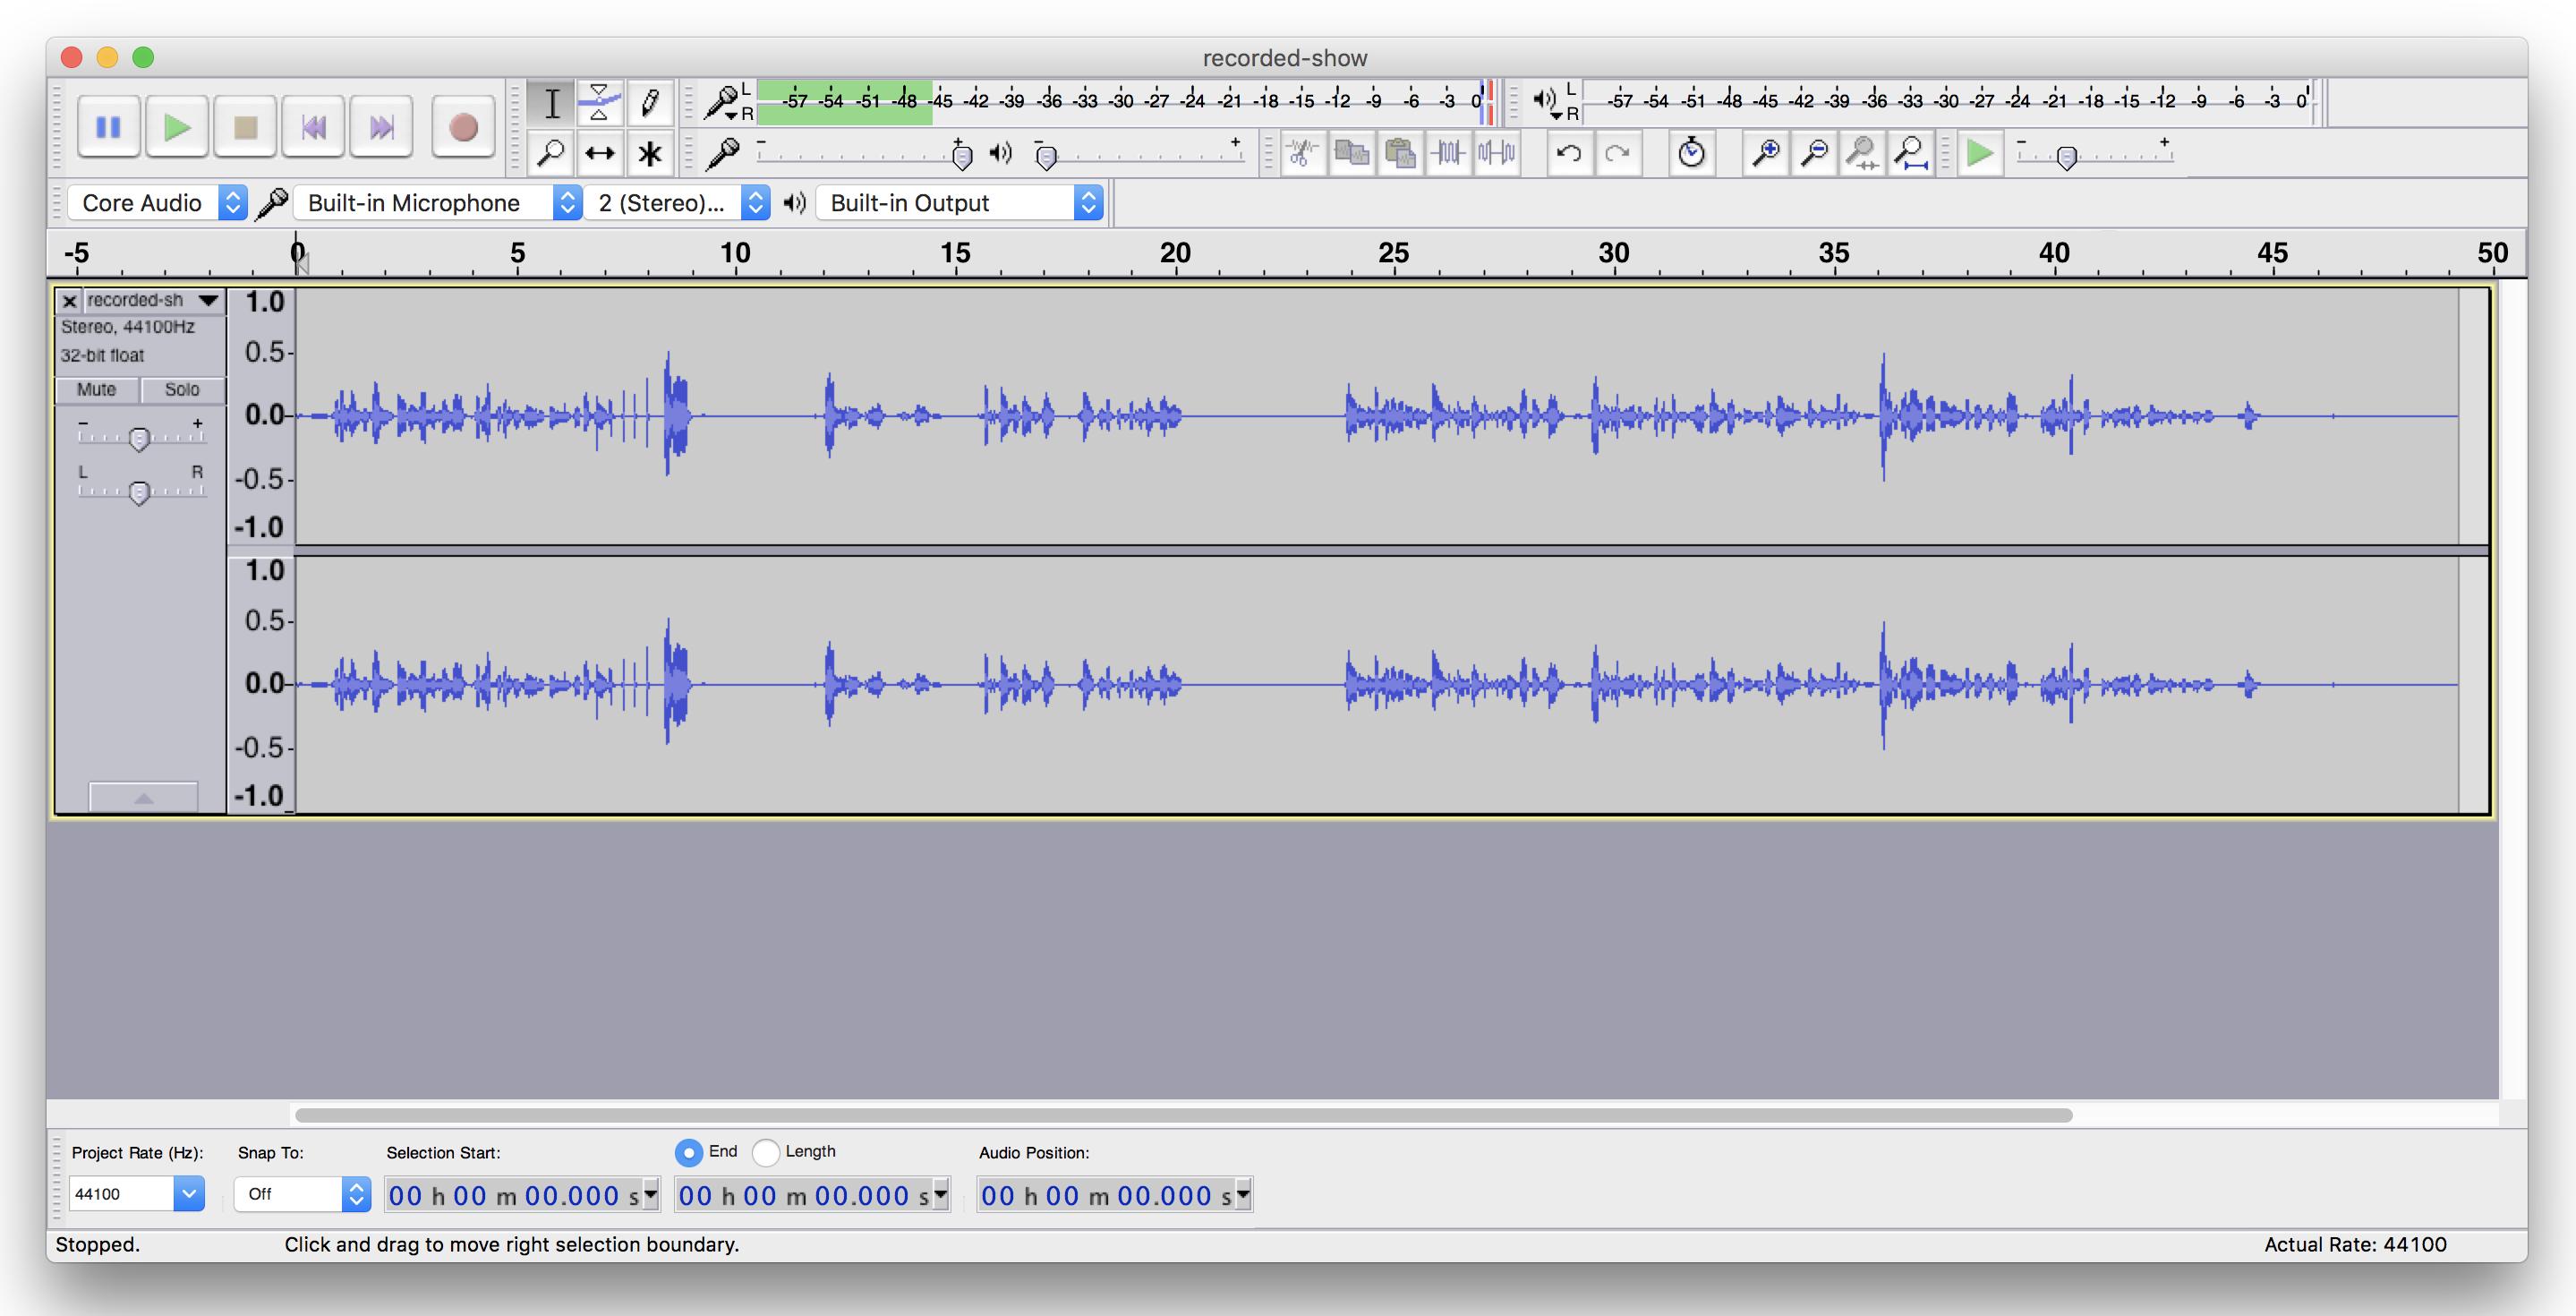 Imported Audio into Audacity radio editing